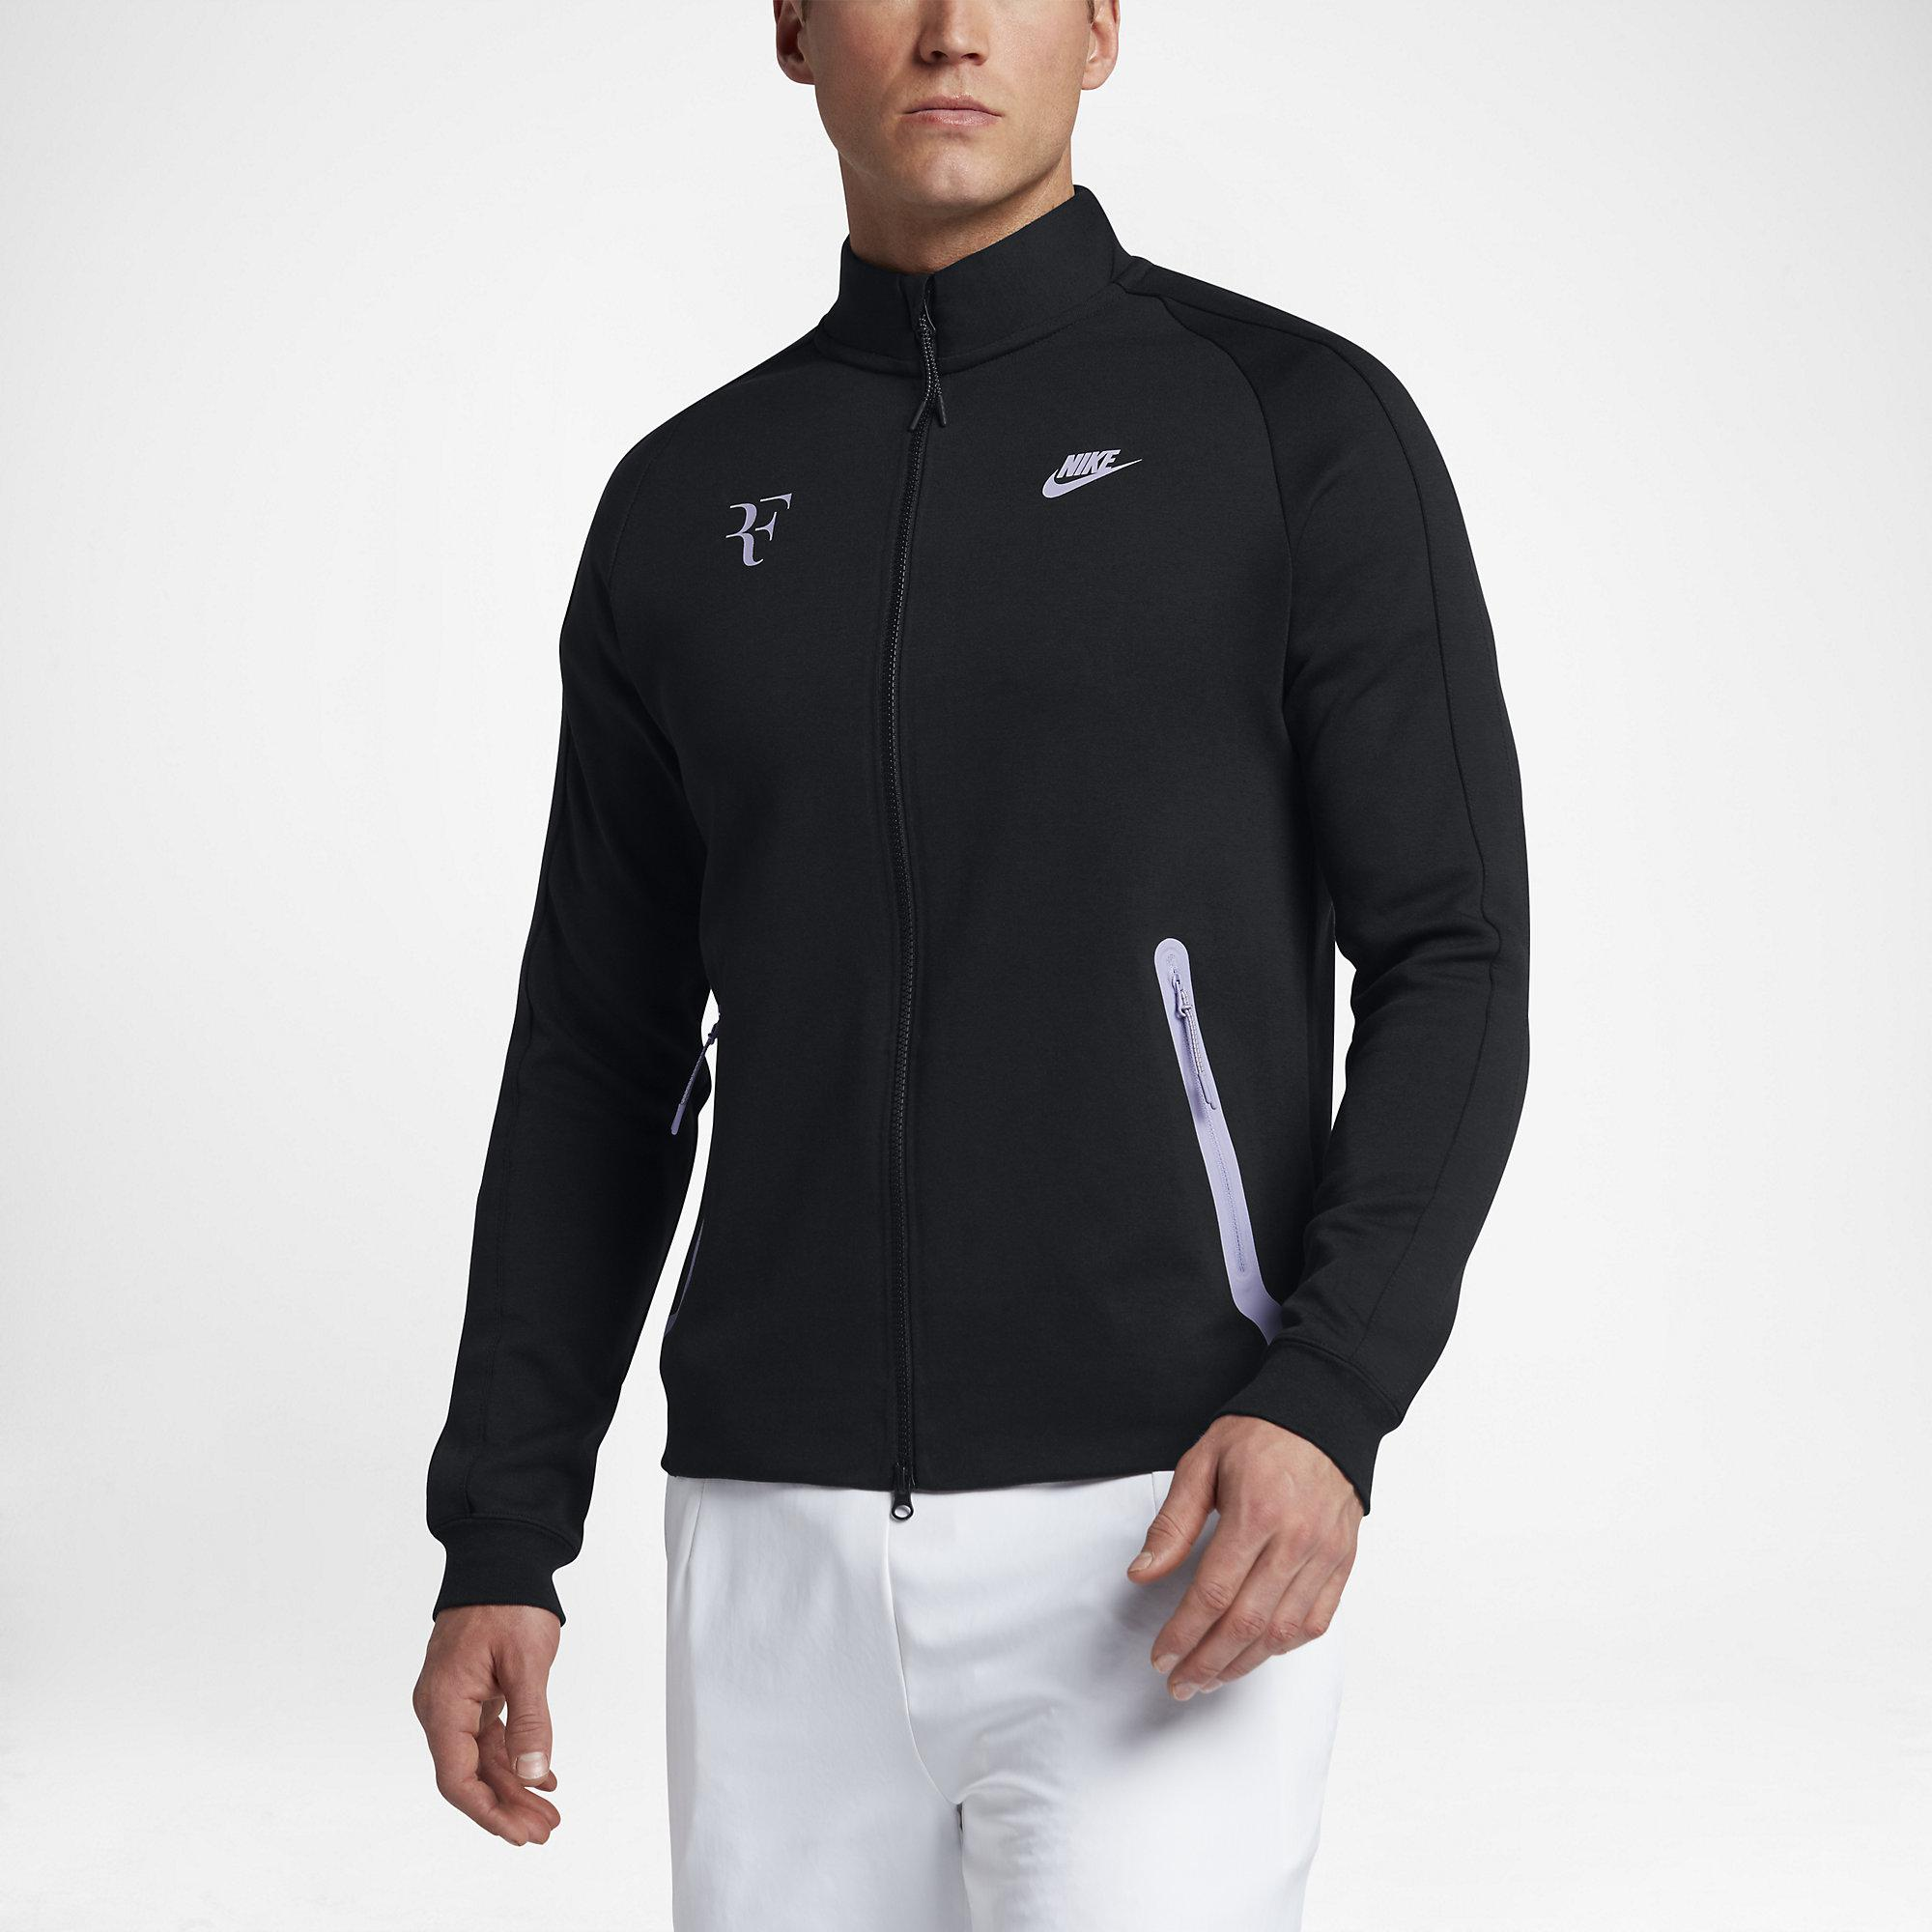 6deaaaa6bbe Nike Mens Premier RF Jacket - Black Hydrangeas - Tennisnuts.com